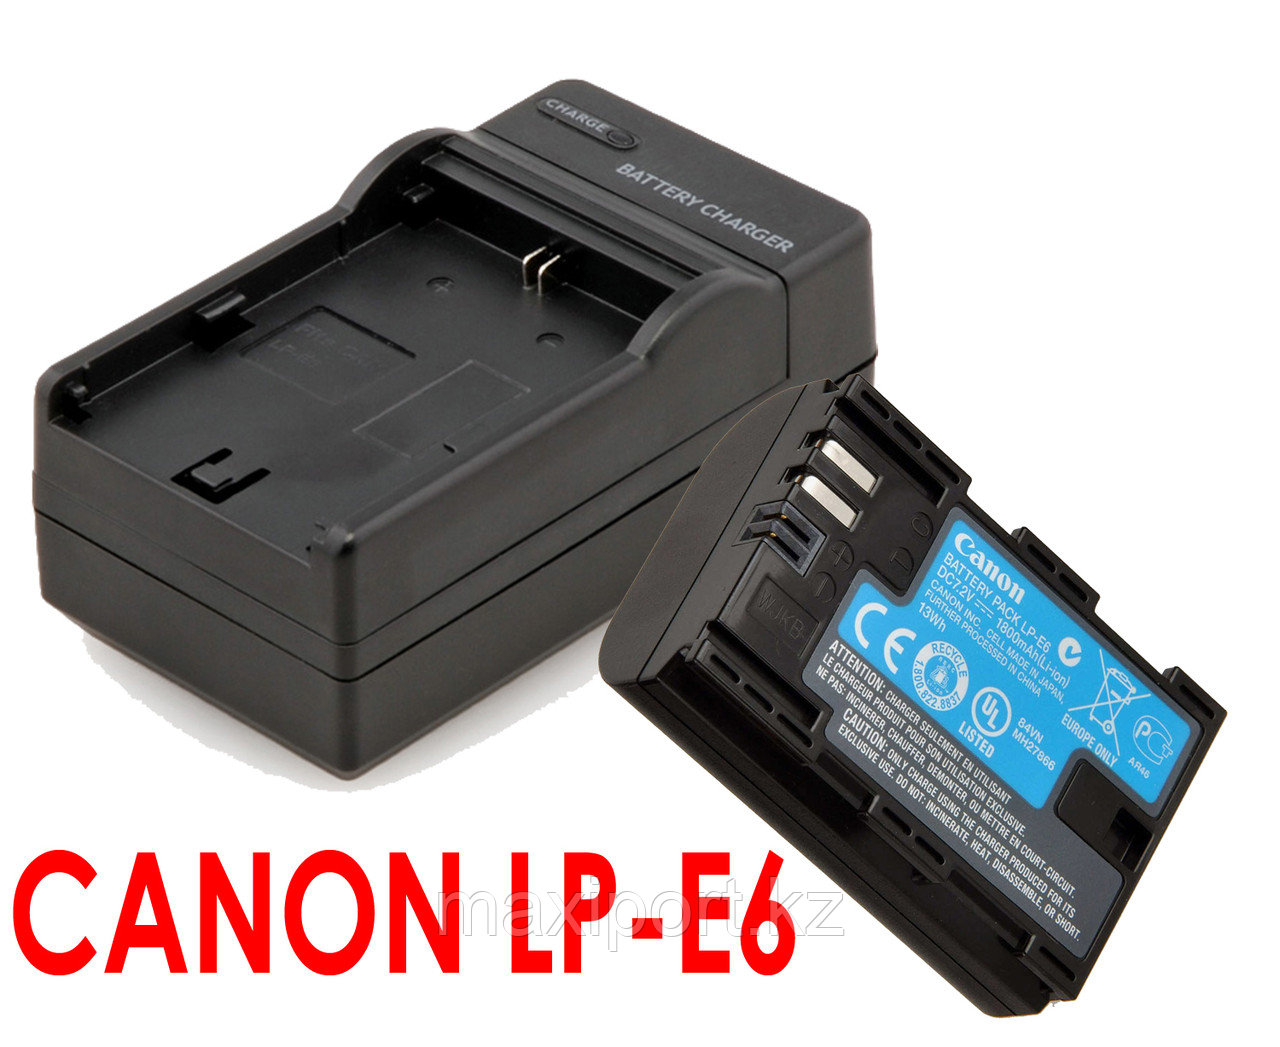 Зарядка canon lp-e6 LP-E6